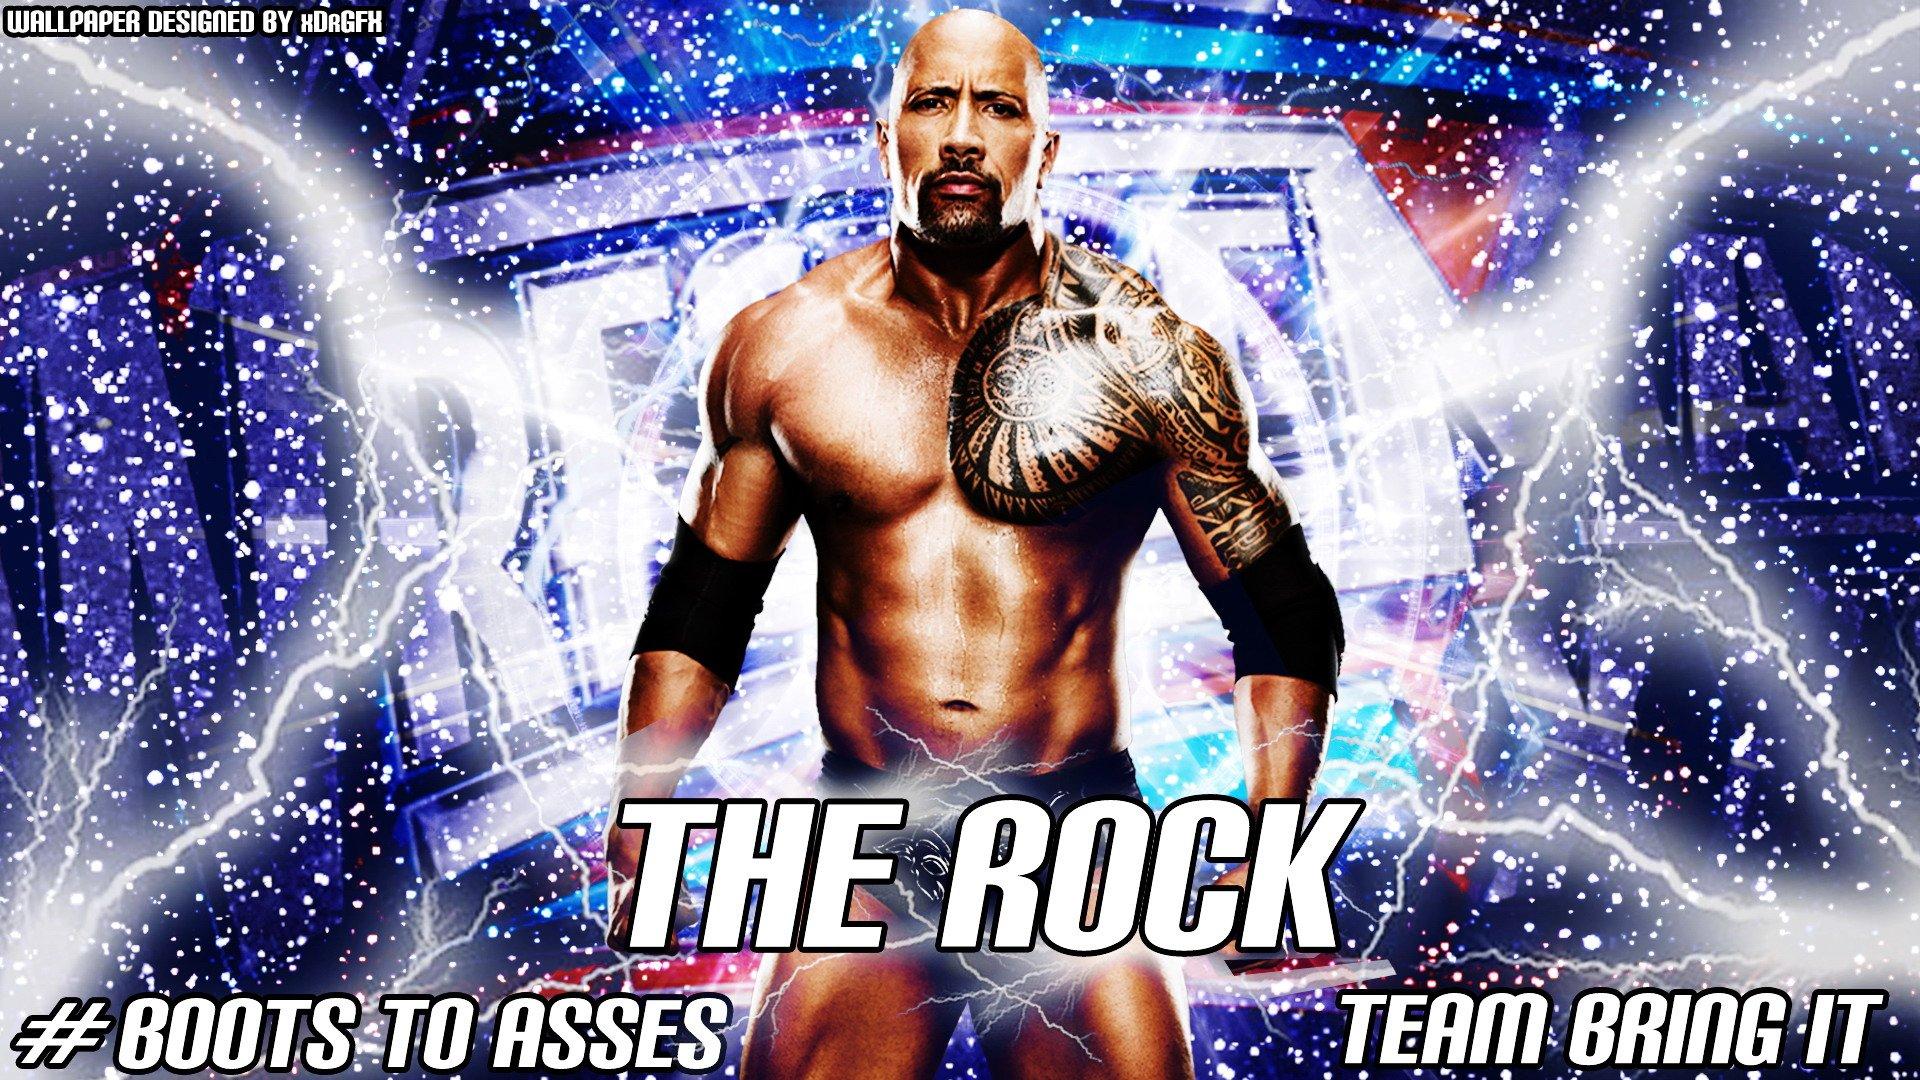 The Rock HD Wallpapers WWE Free 1920x1080